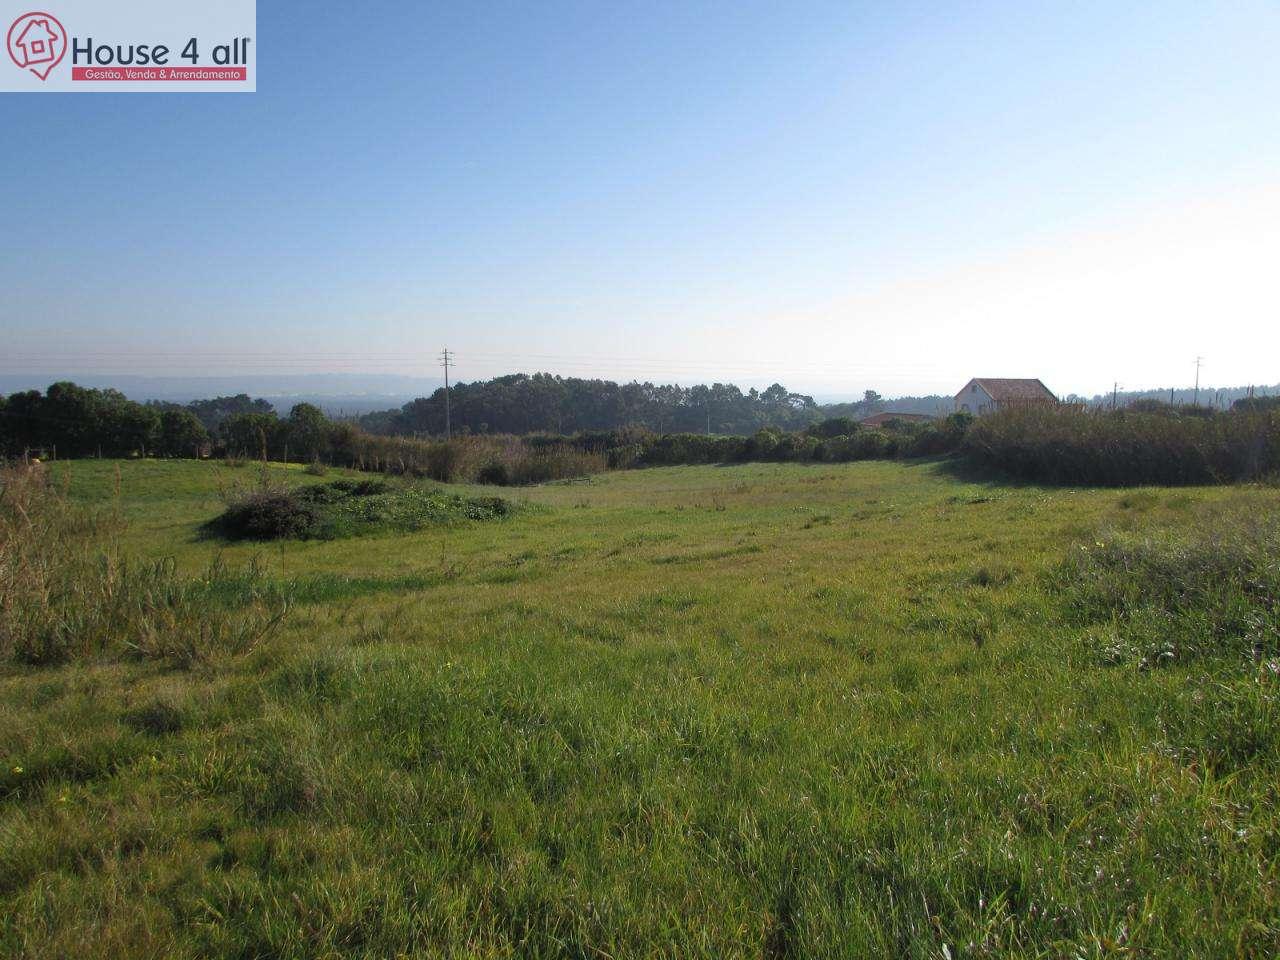 Terreno para comprar, Caldas da Rainha - Santo Onofre e Serra do Bouro, Leiria - Foto 1